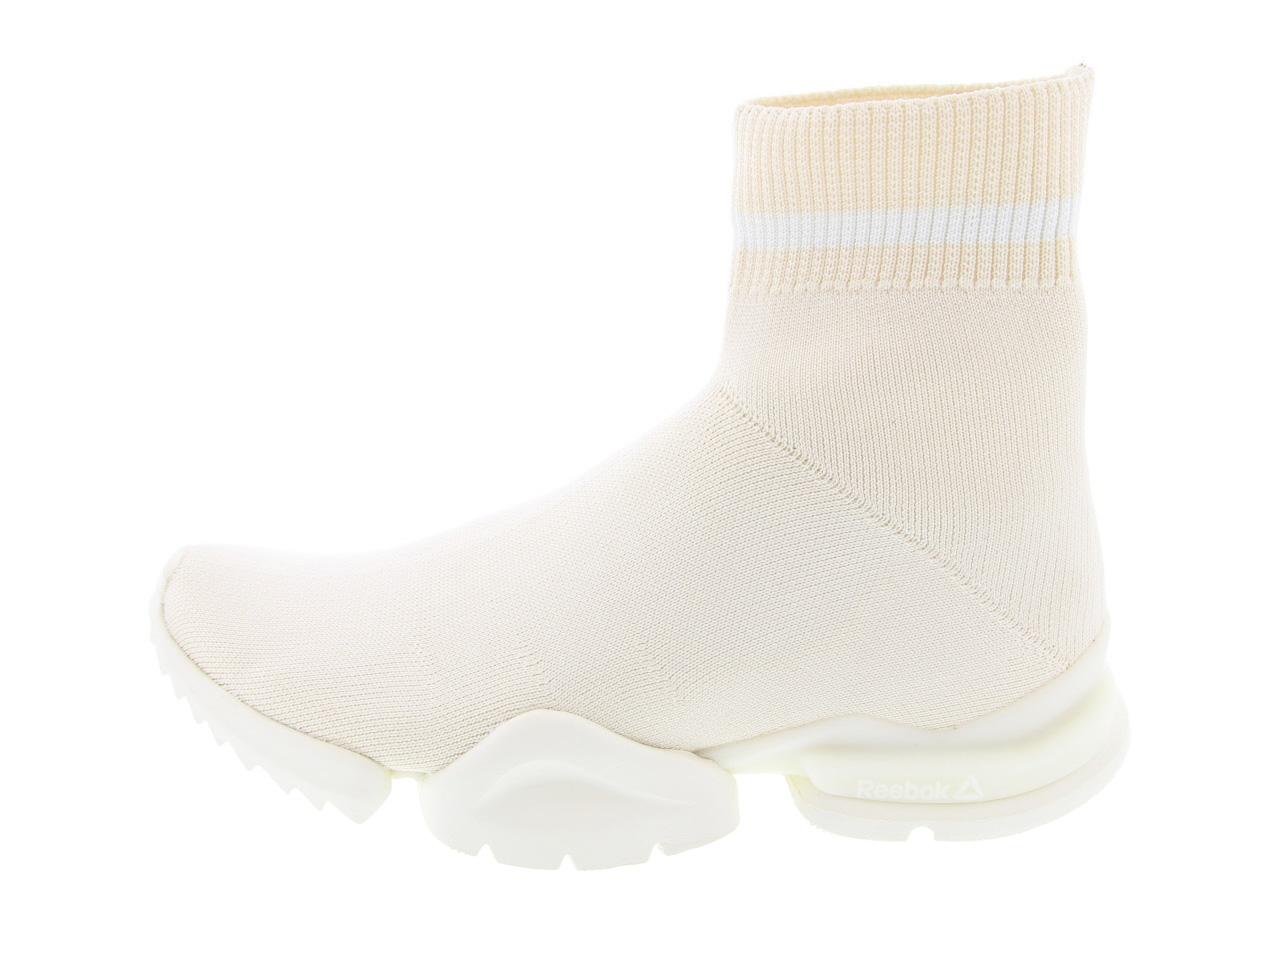 【60%OFF!】Reebok SOCK RUN R(CN4591)【リーボック ソックランR】【メンズファッション】【シューズ】【スニーカー】【靴】【フットウェア】【バーゲン】